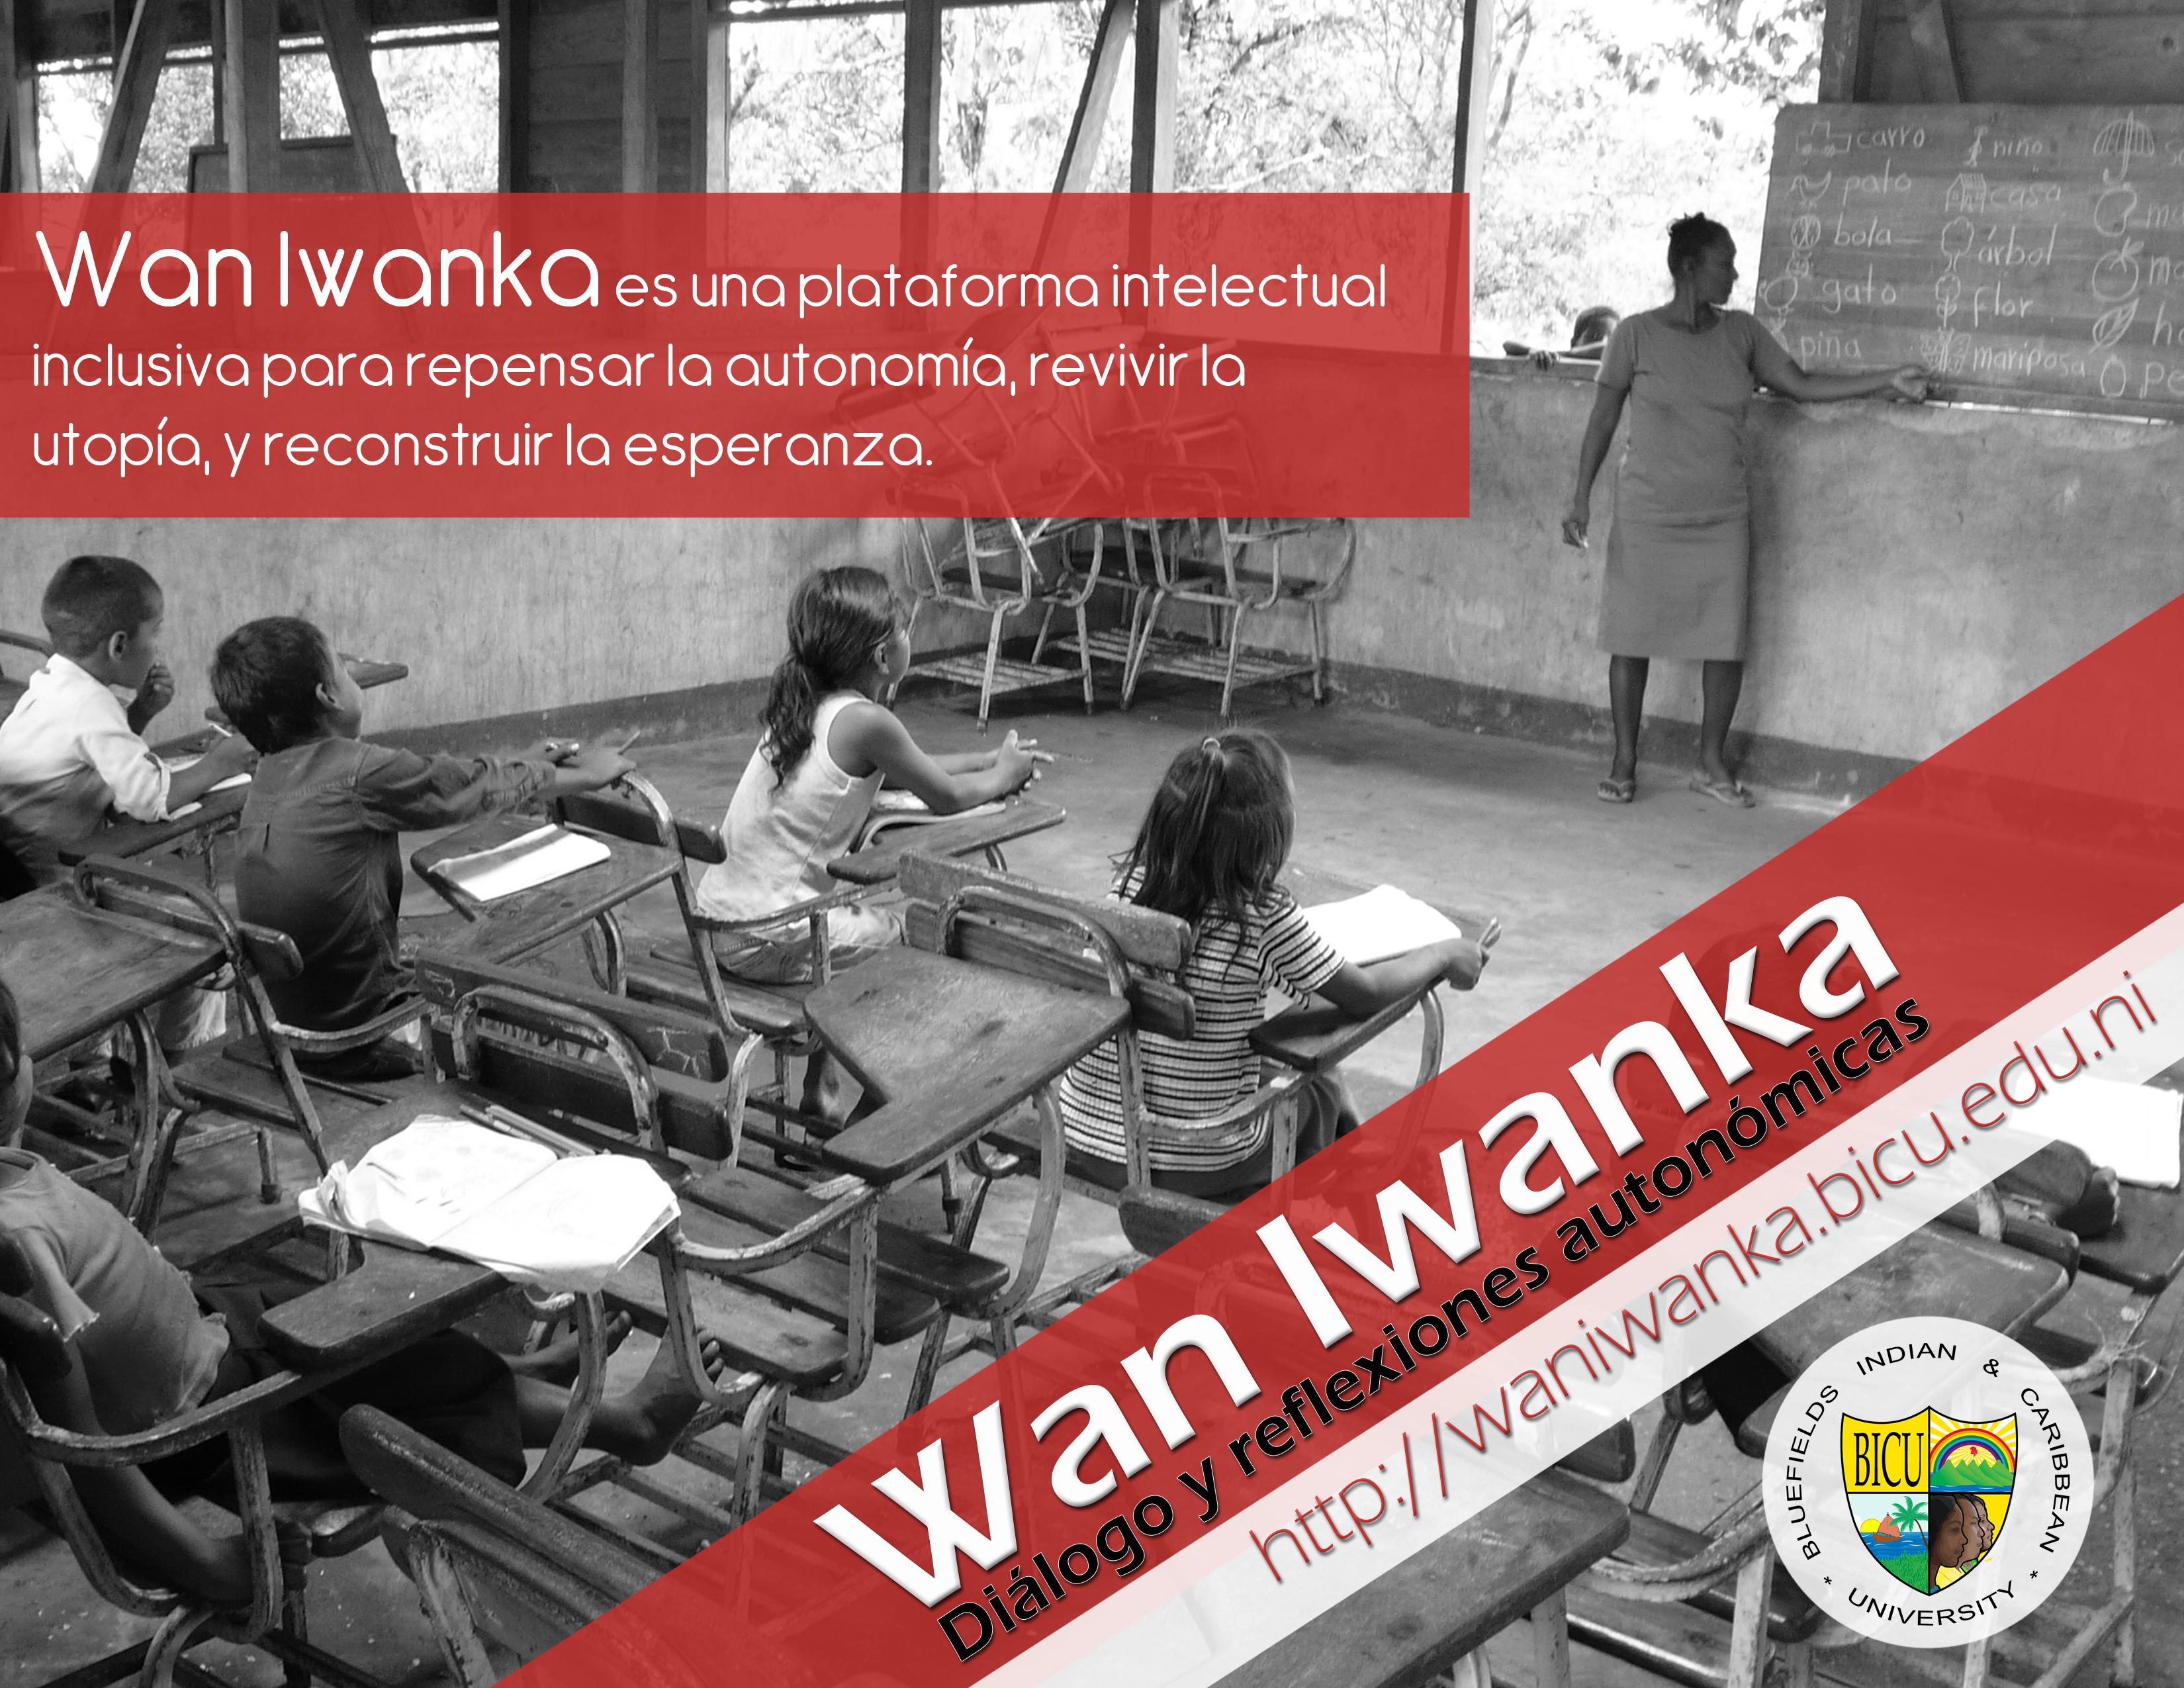 Waniwanka